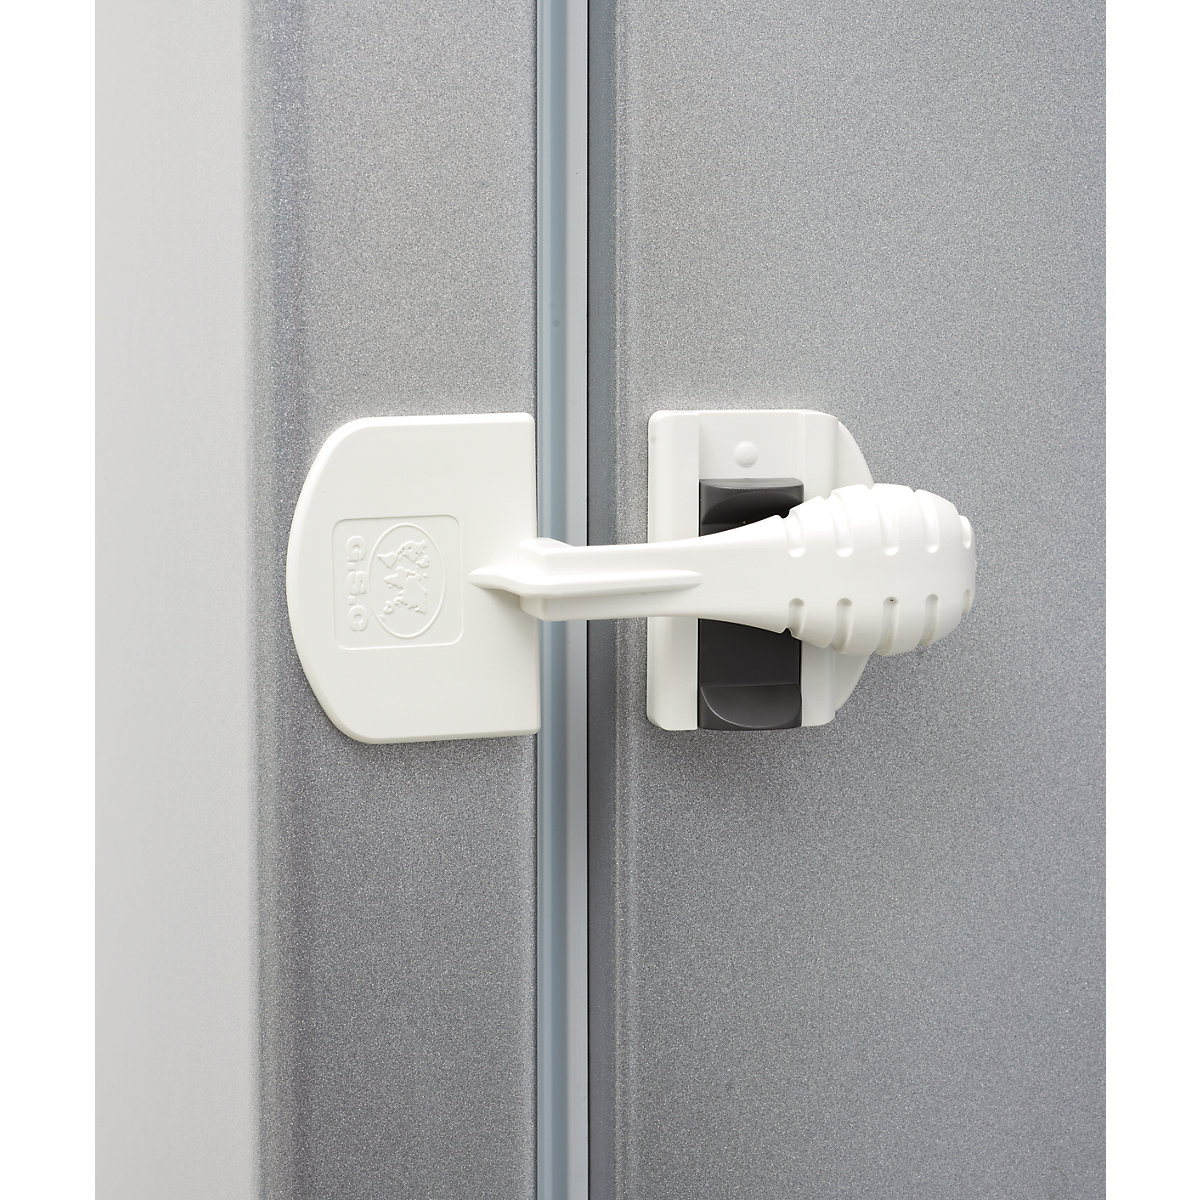 'Mothercare Fridge/freezer Lock - 1 Lock